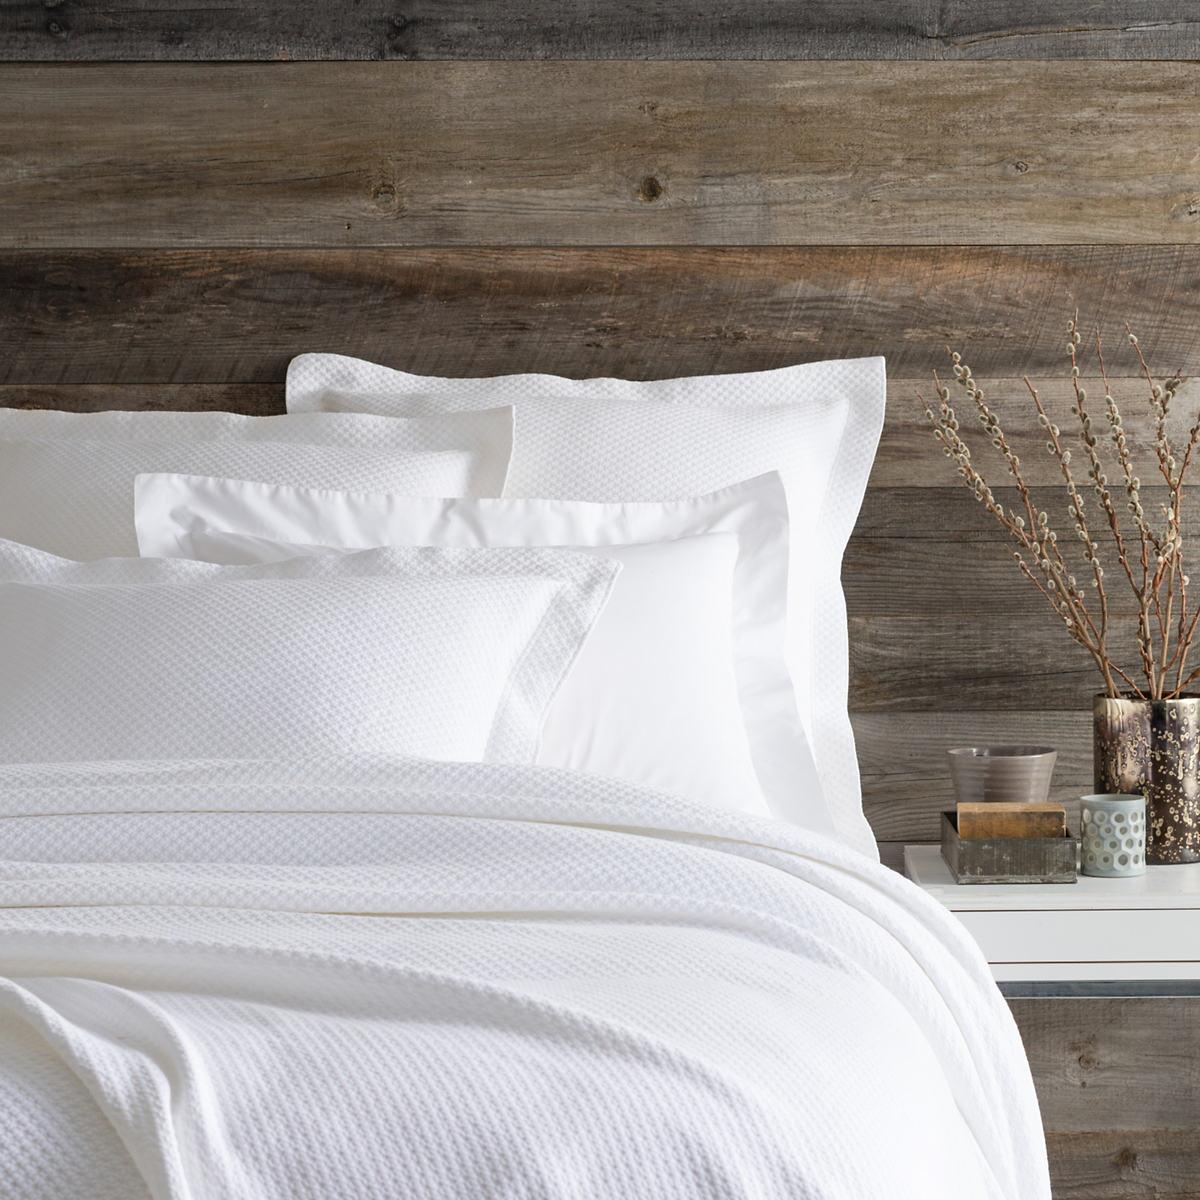 Pine Cone Hill; U003e Bedding. Petite Trellis White Matelassé Coverlet